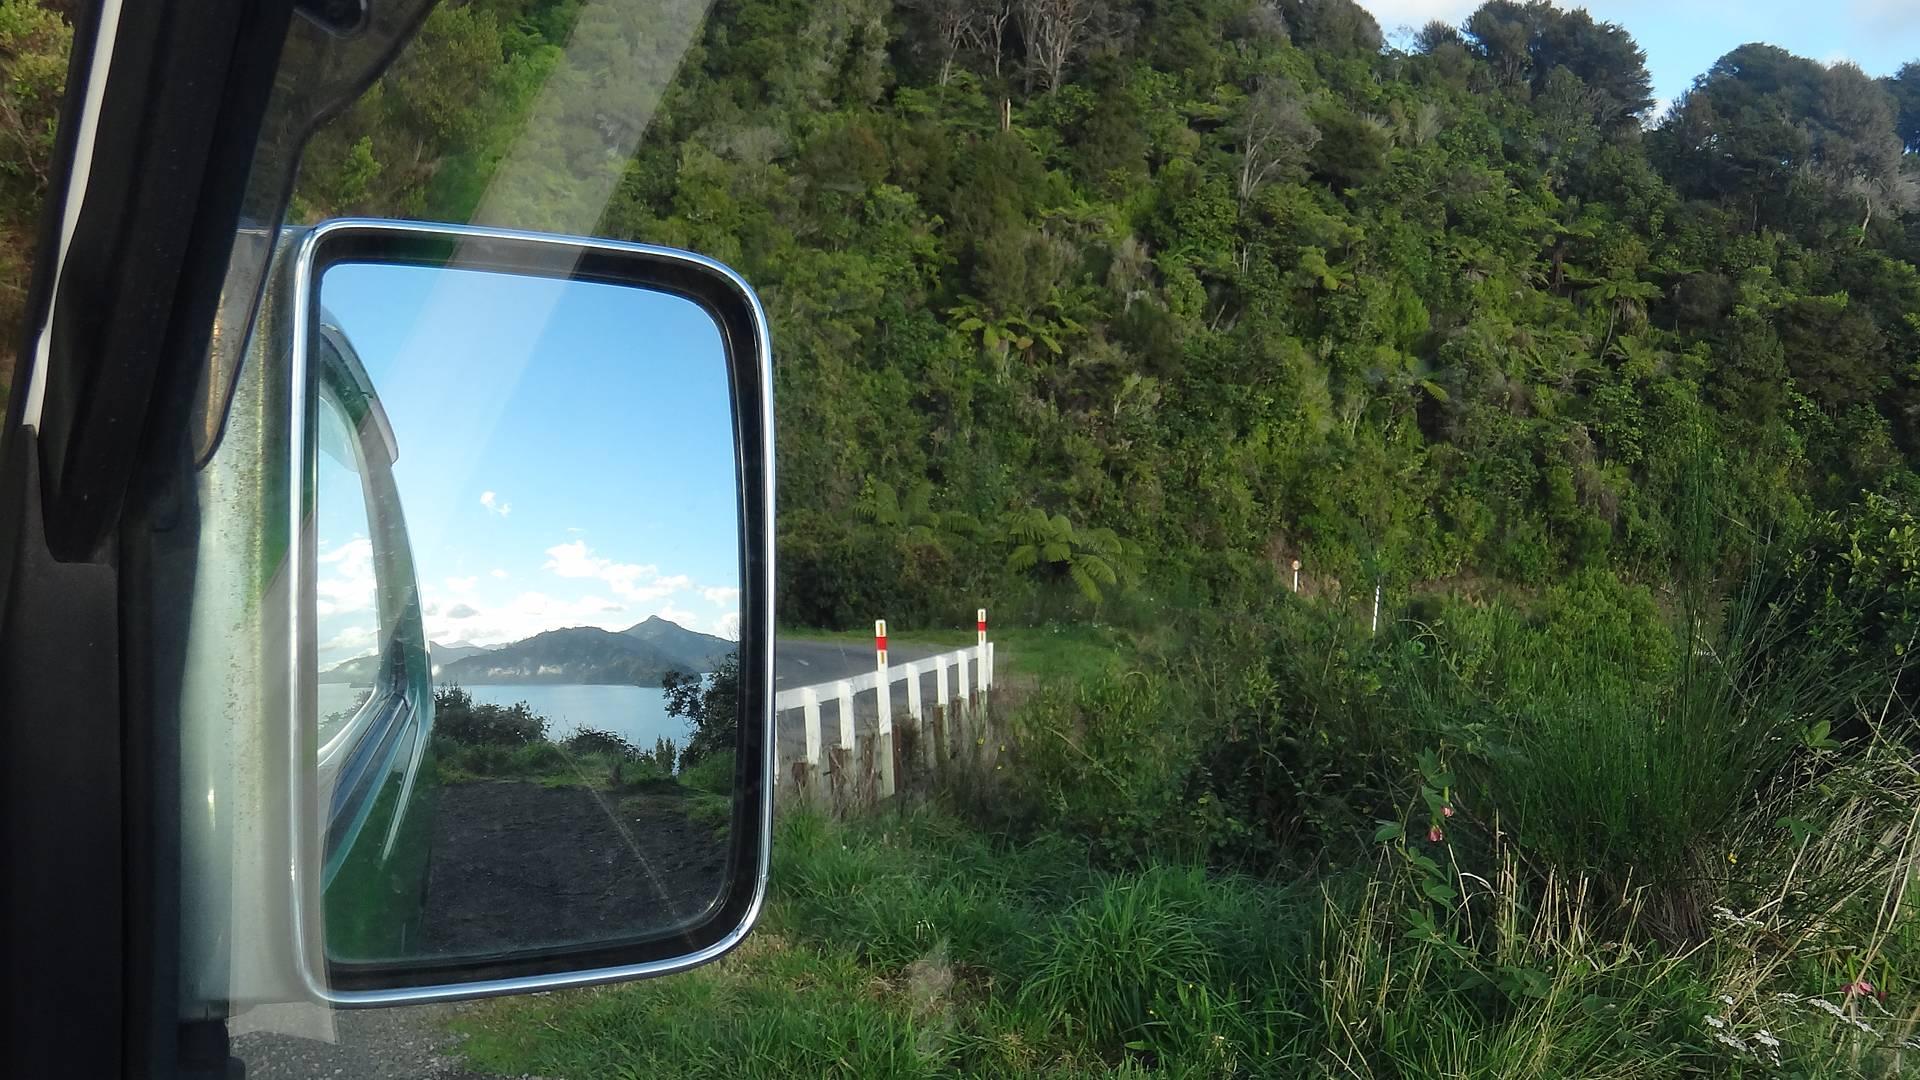 Selbstfahrertour - ausgiebig genießen